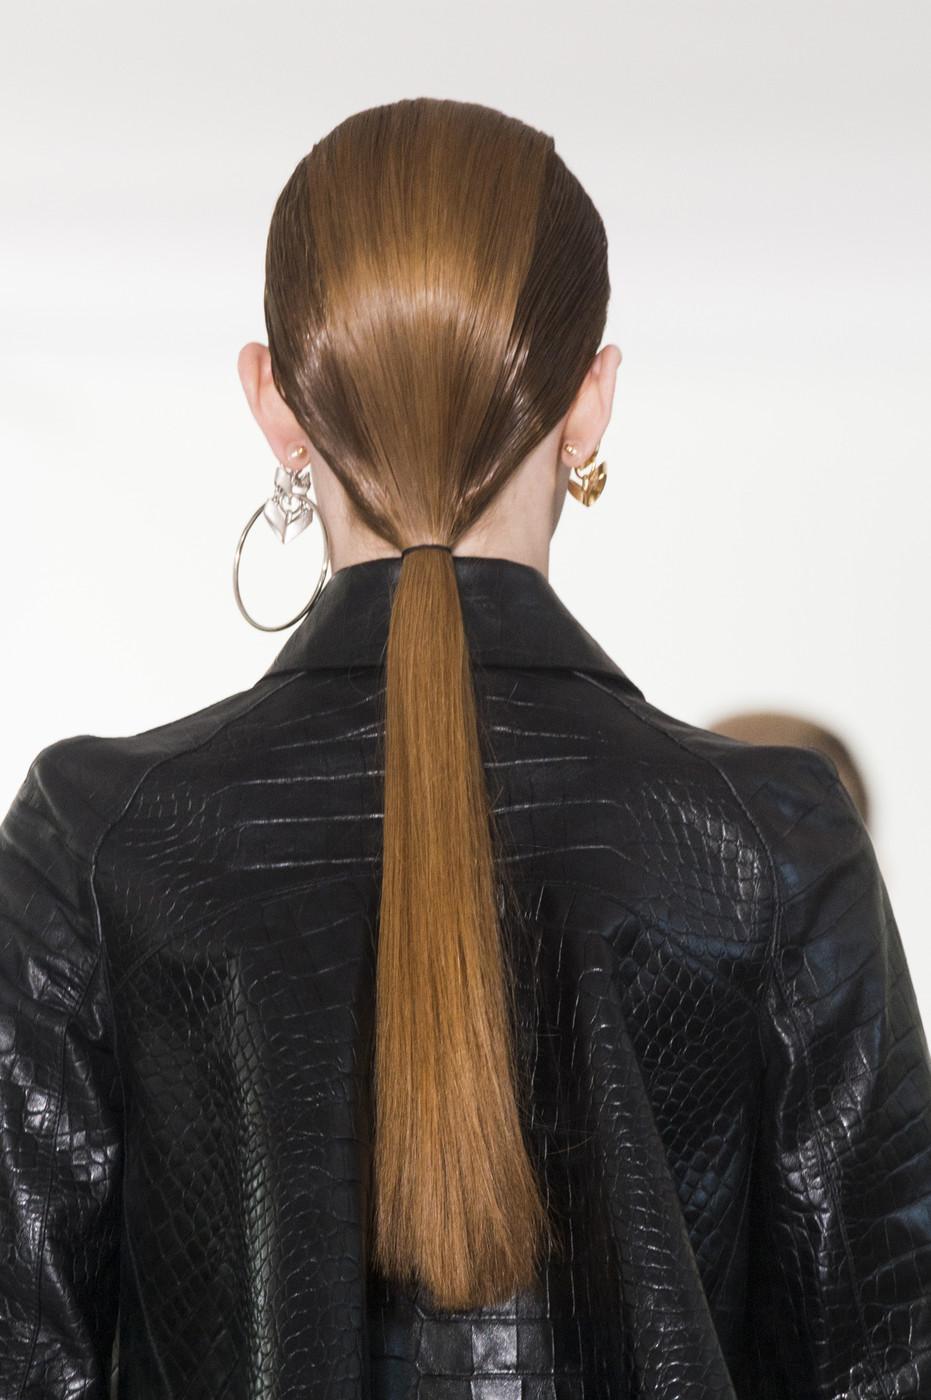 بالصور تسريحات شعر بسيطة , سرحي شعرك تسريحات بسيطة و رقيقة 3855 19